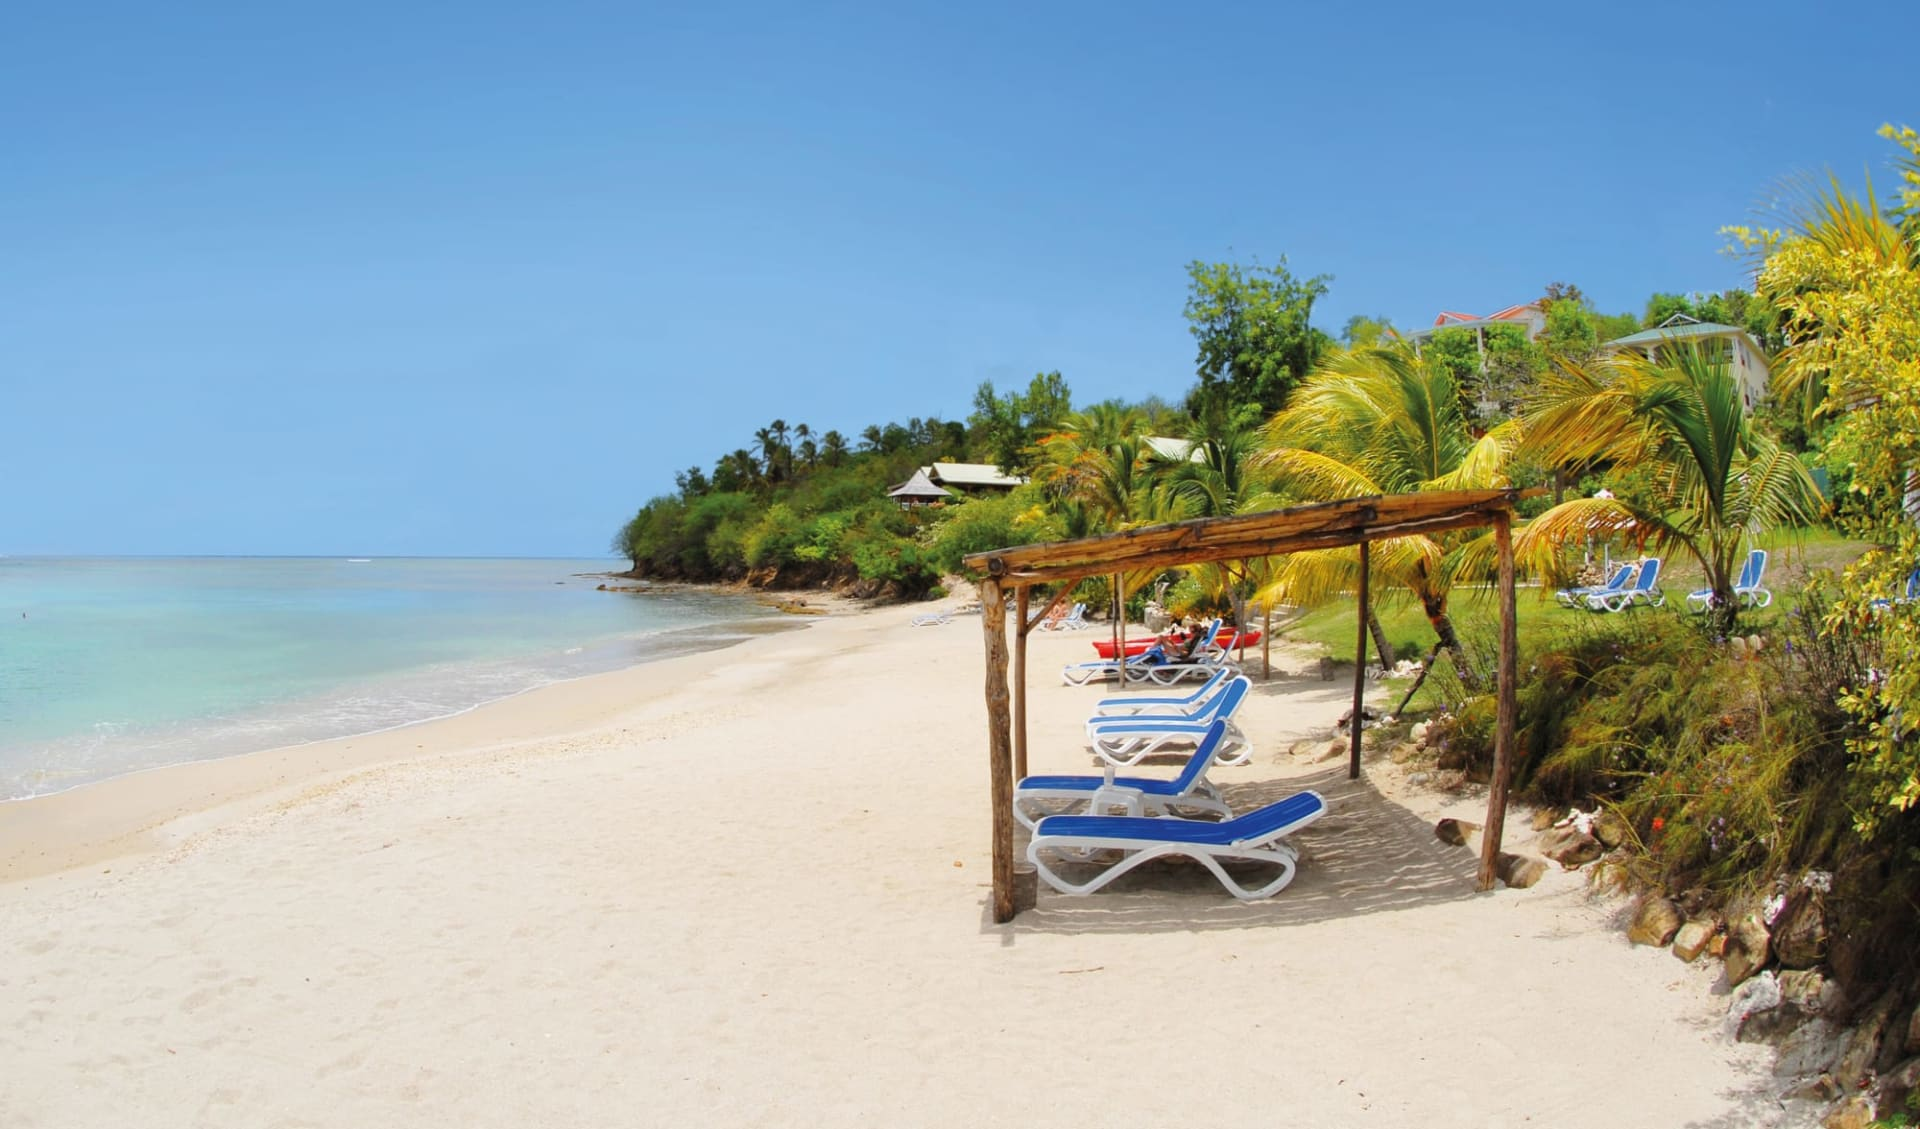 Calabash Cove Resort and Spa in Marisule:   Calabash Cove St. Lucia - Strand cHotel